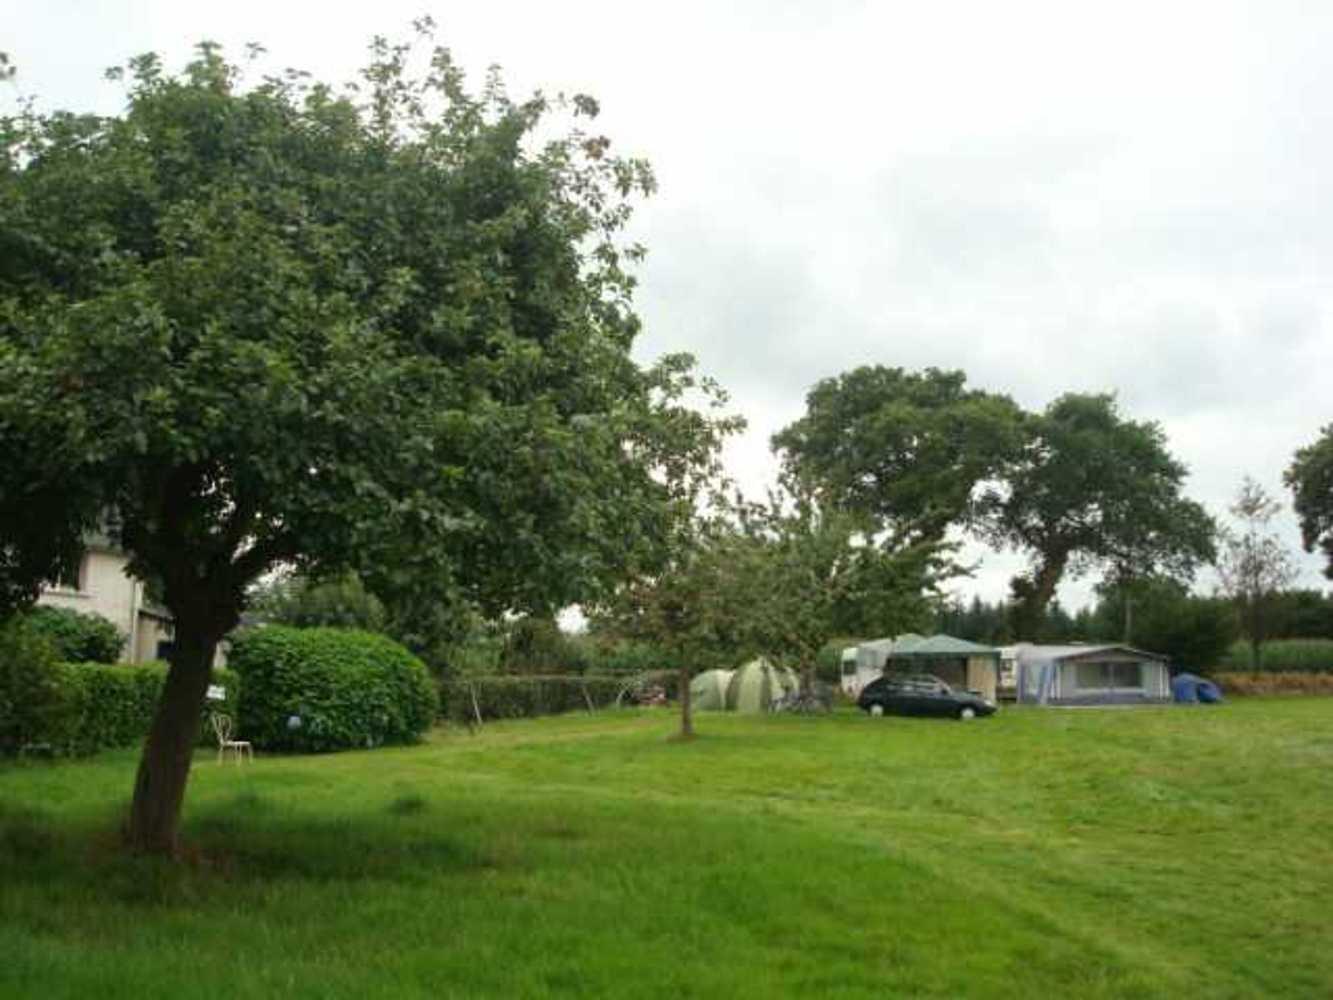 Camping Garmorin camping